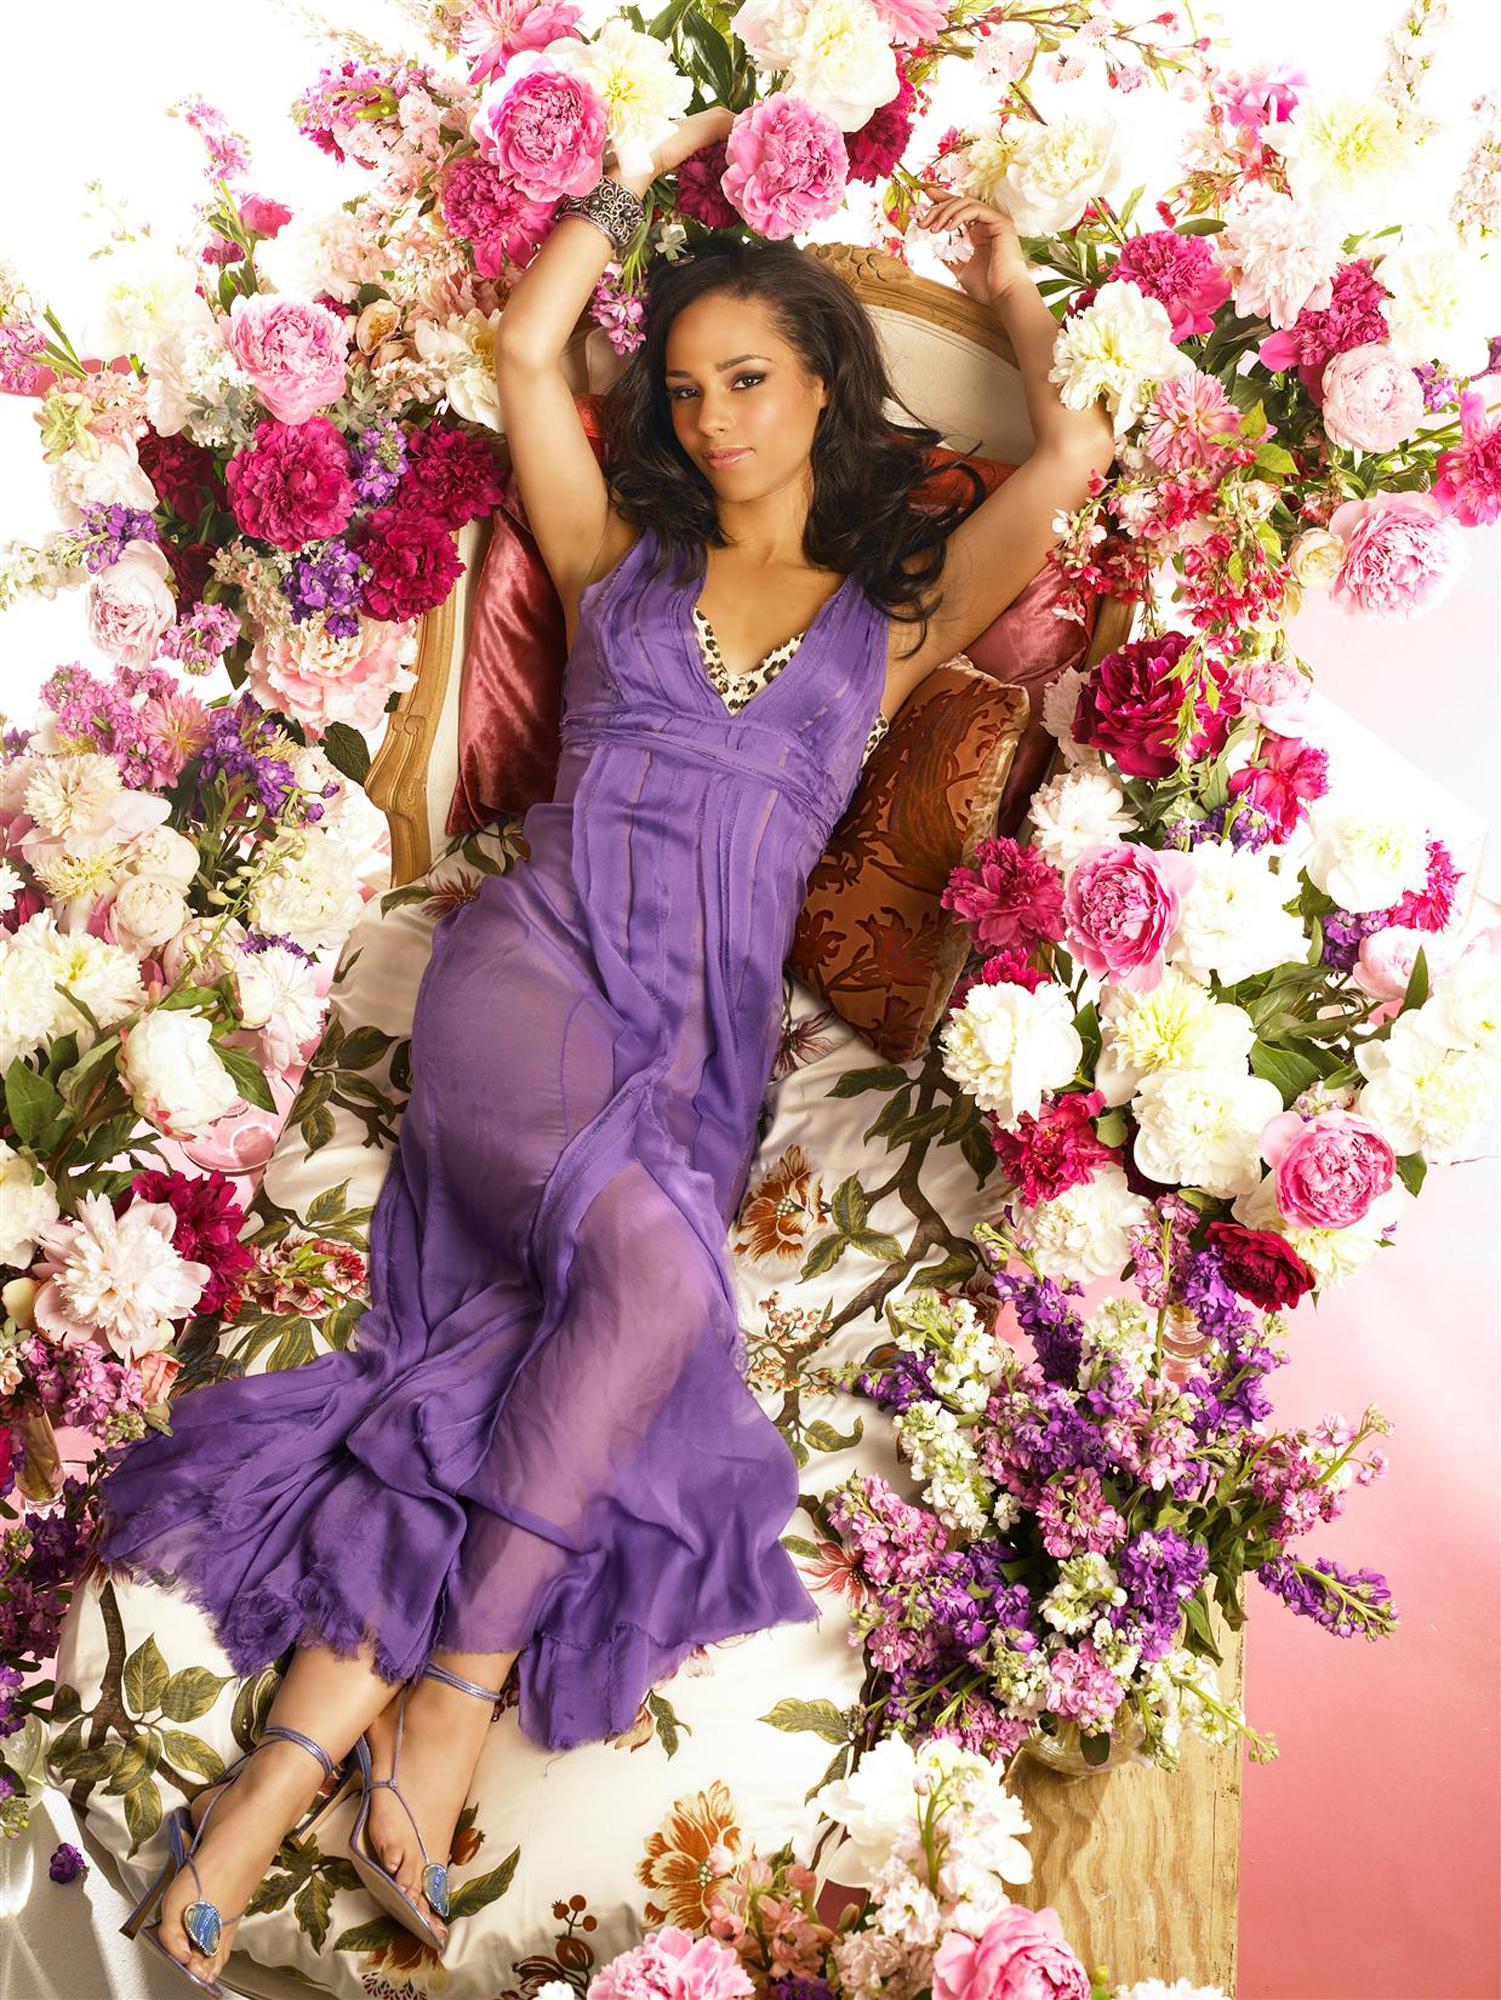 Алиша Кис (Alicia Keys) в фотосессии Стюарта Шайнинга (Stewart Shining